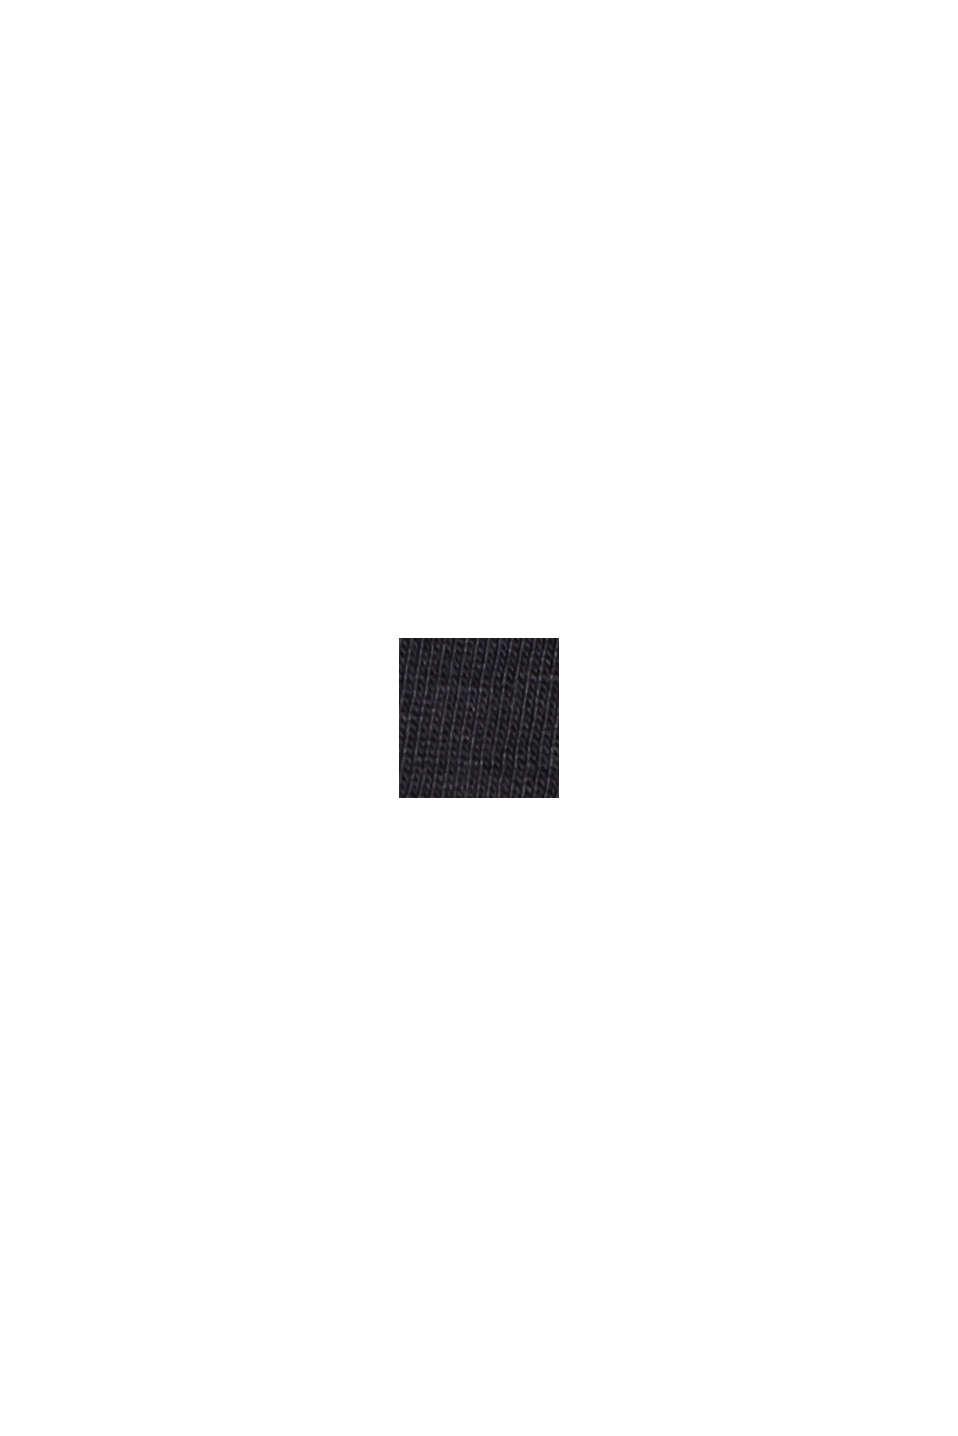 Jersey sleeveless top, 100% organic cotton, BLACK, swatch